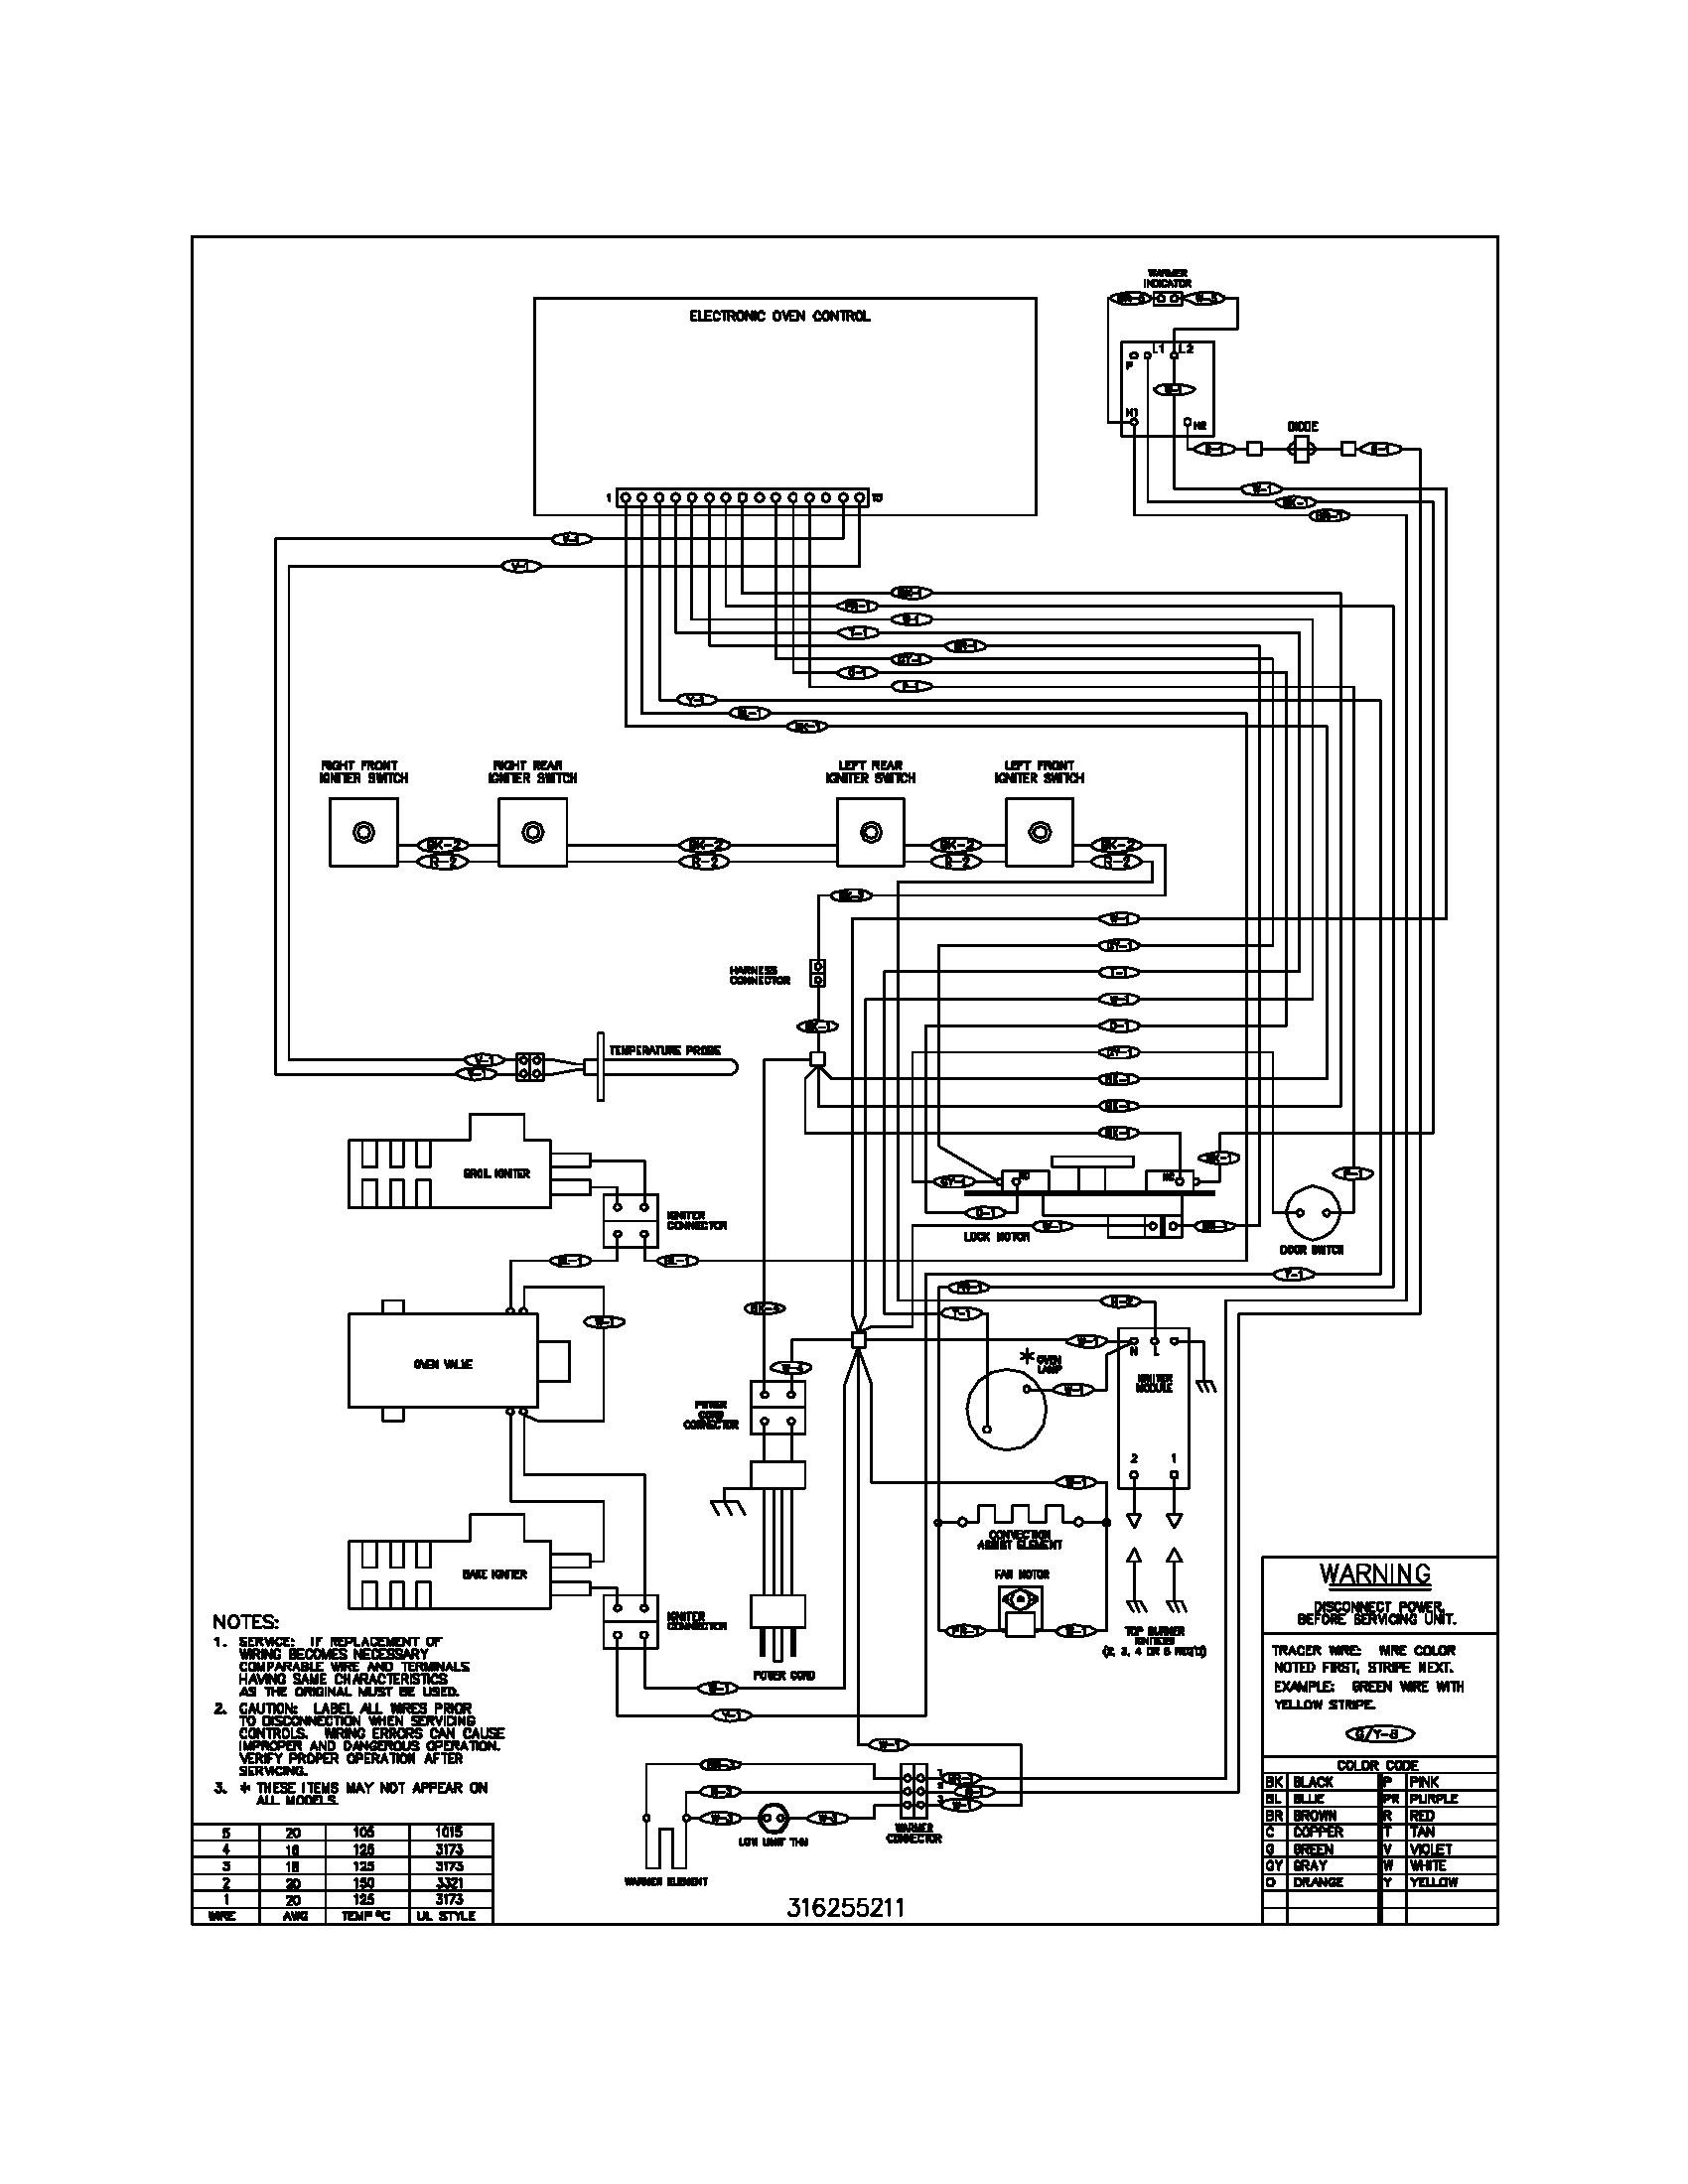 Amazing Wiring Diagram Older Furnace Wiring Diagram Wiring Digital Resources Indicompassionincorg